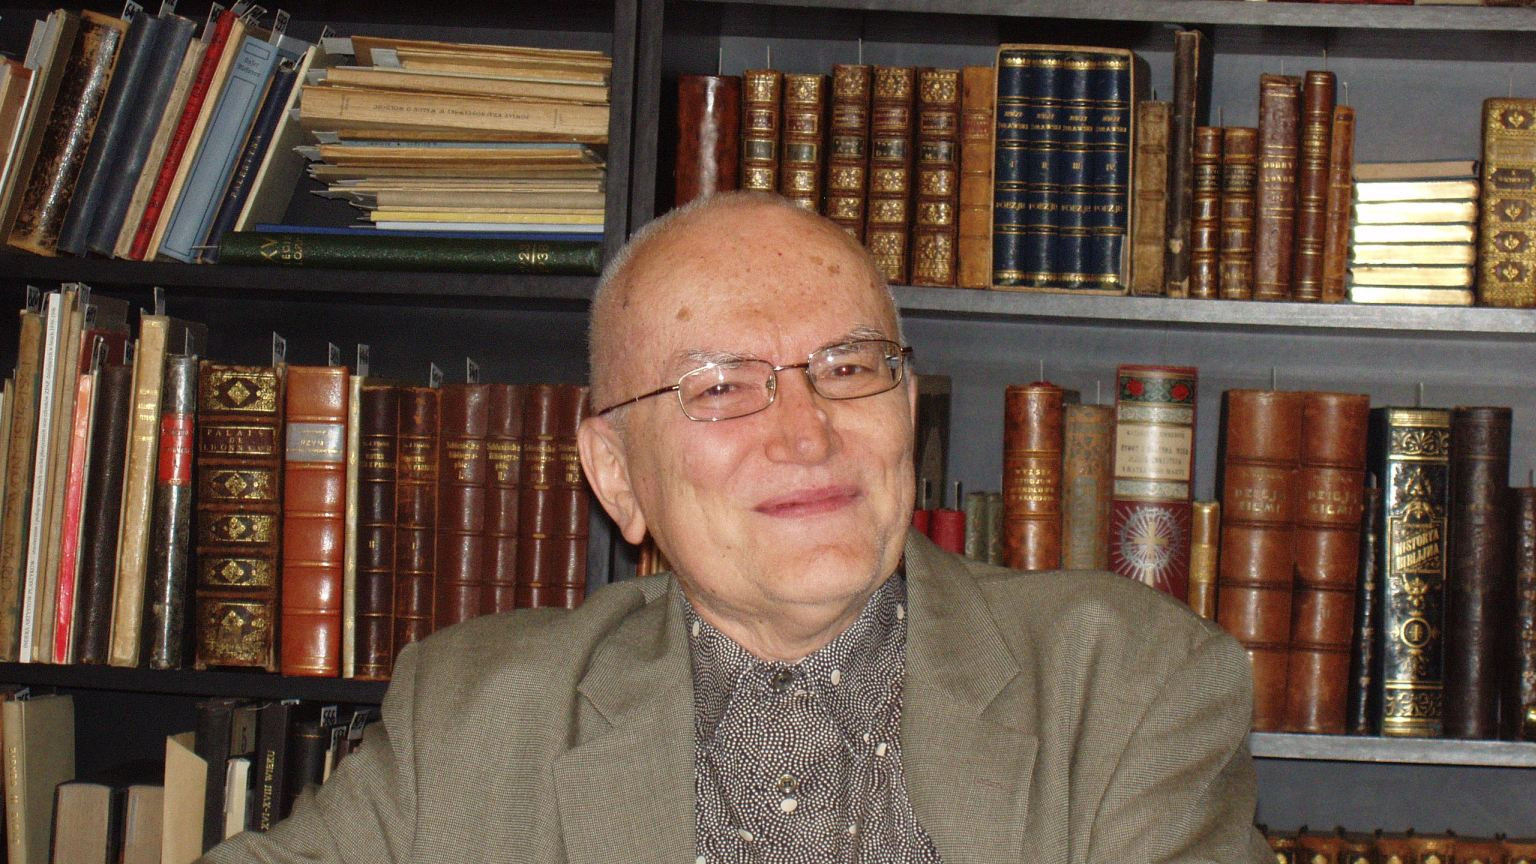 Tomek Maczuga